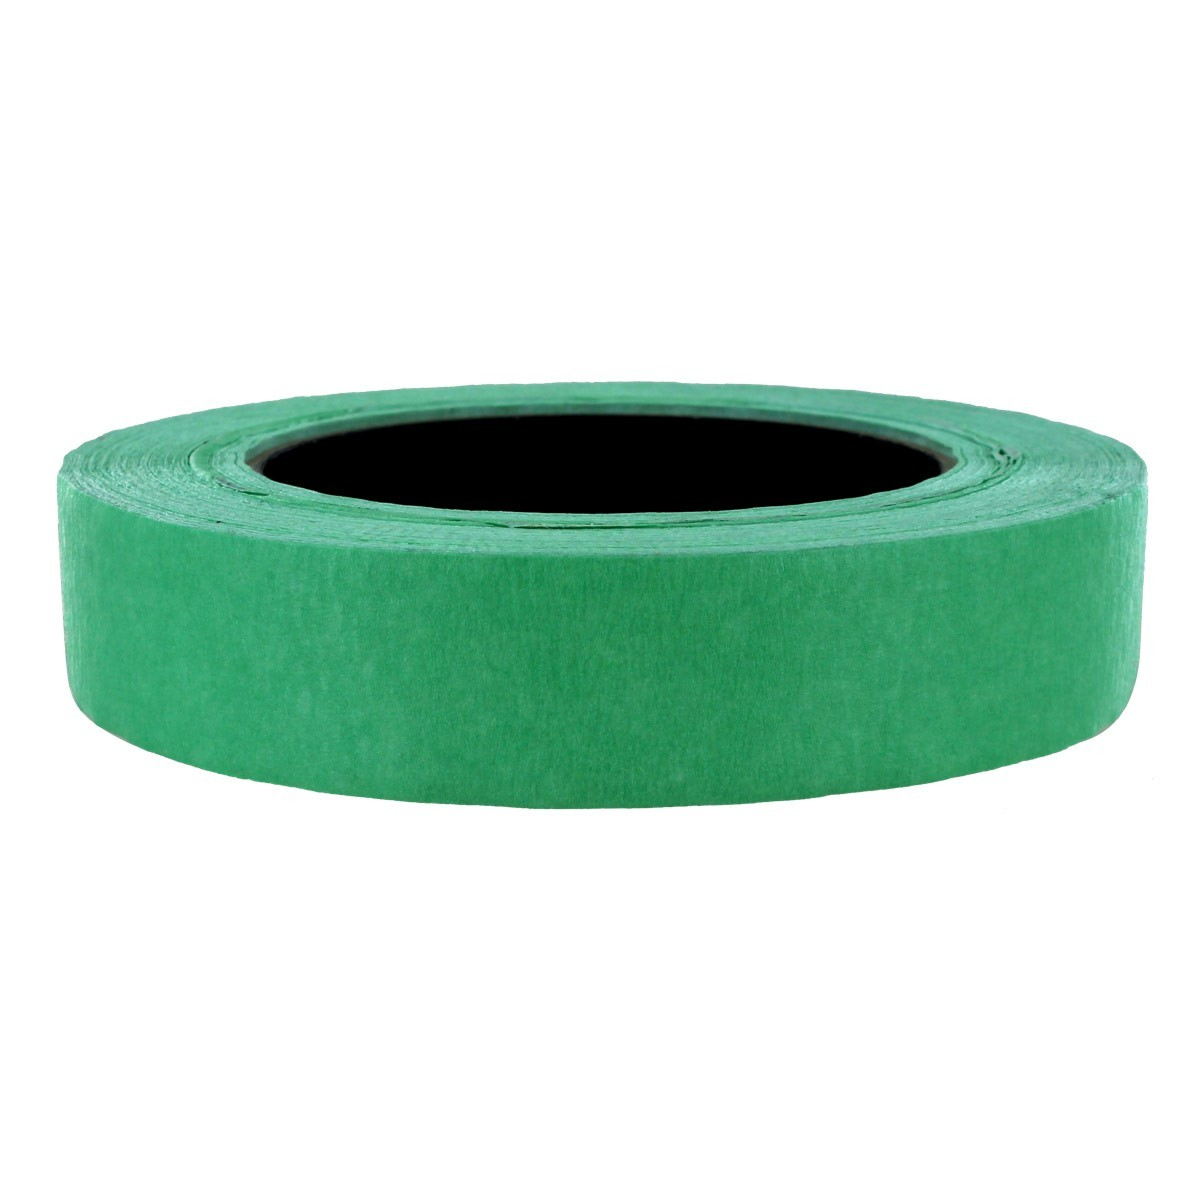 Masking Painters Tape, Green, 24 mm x 55 m, 3M 205, 48/cs